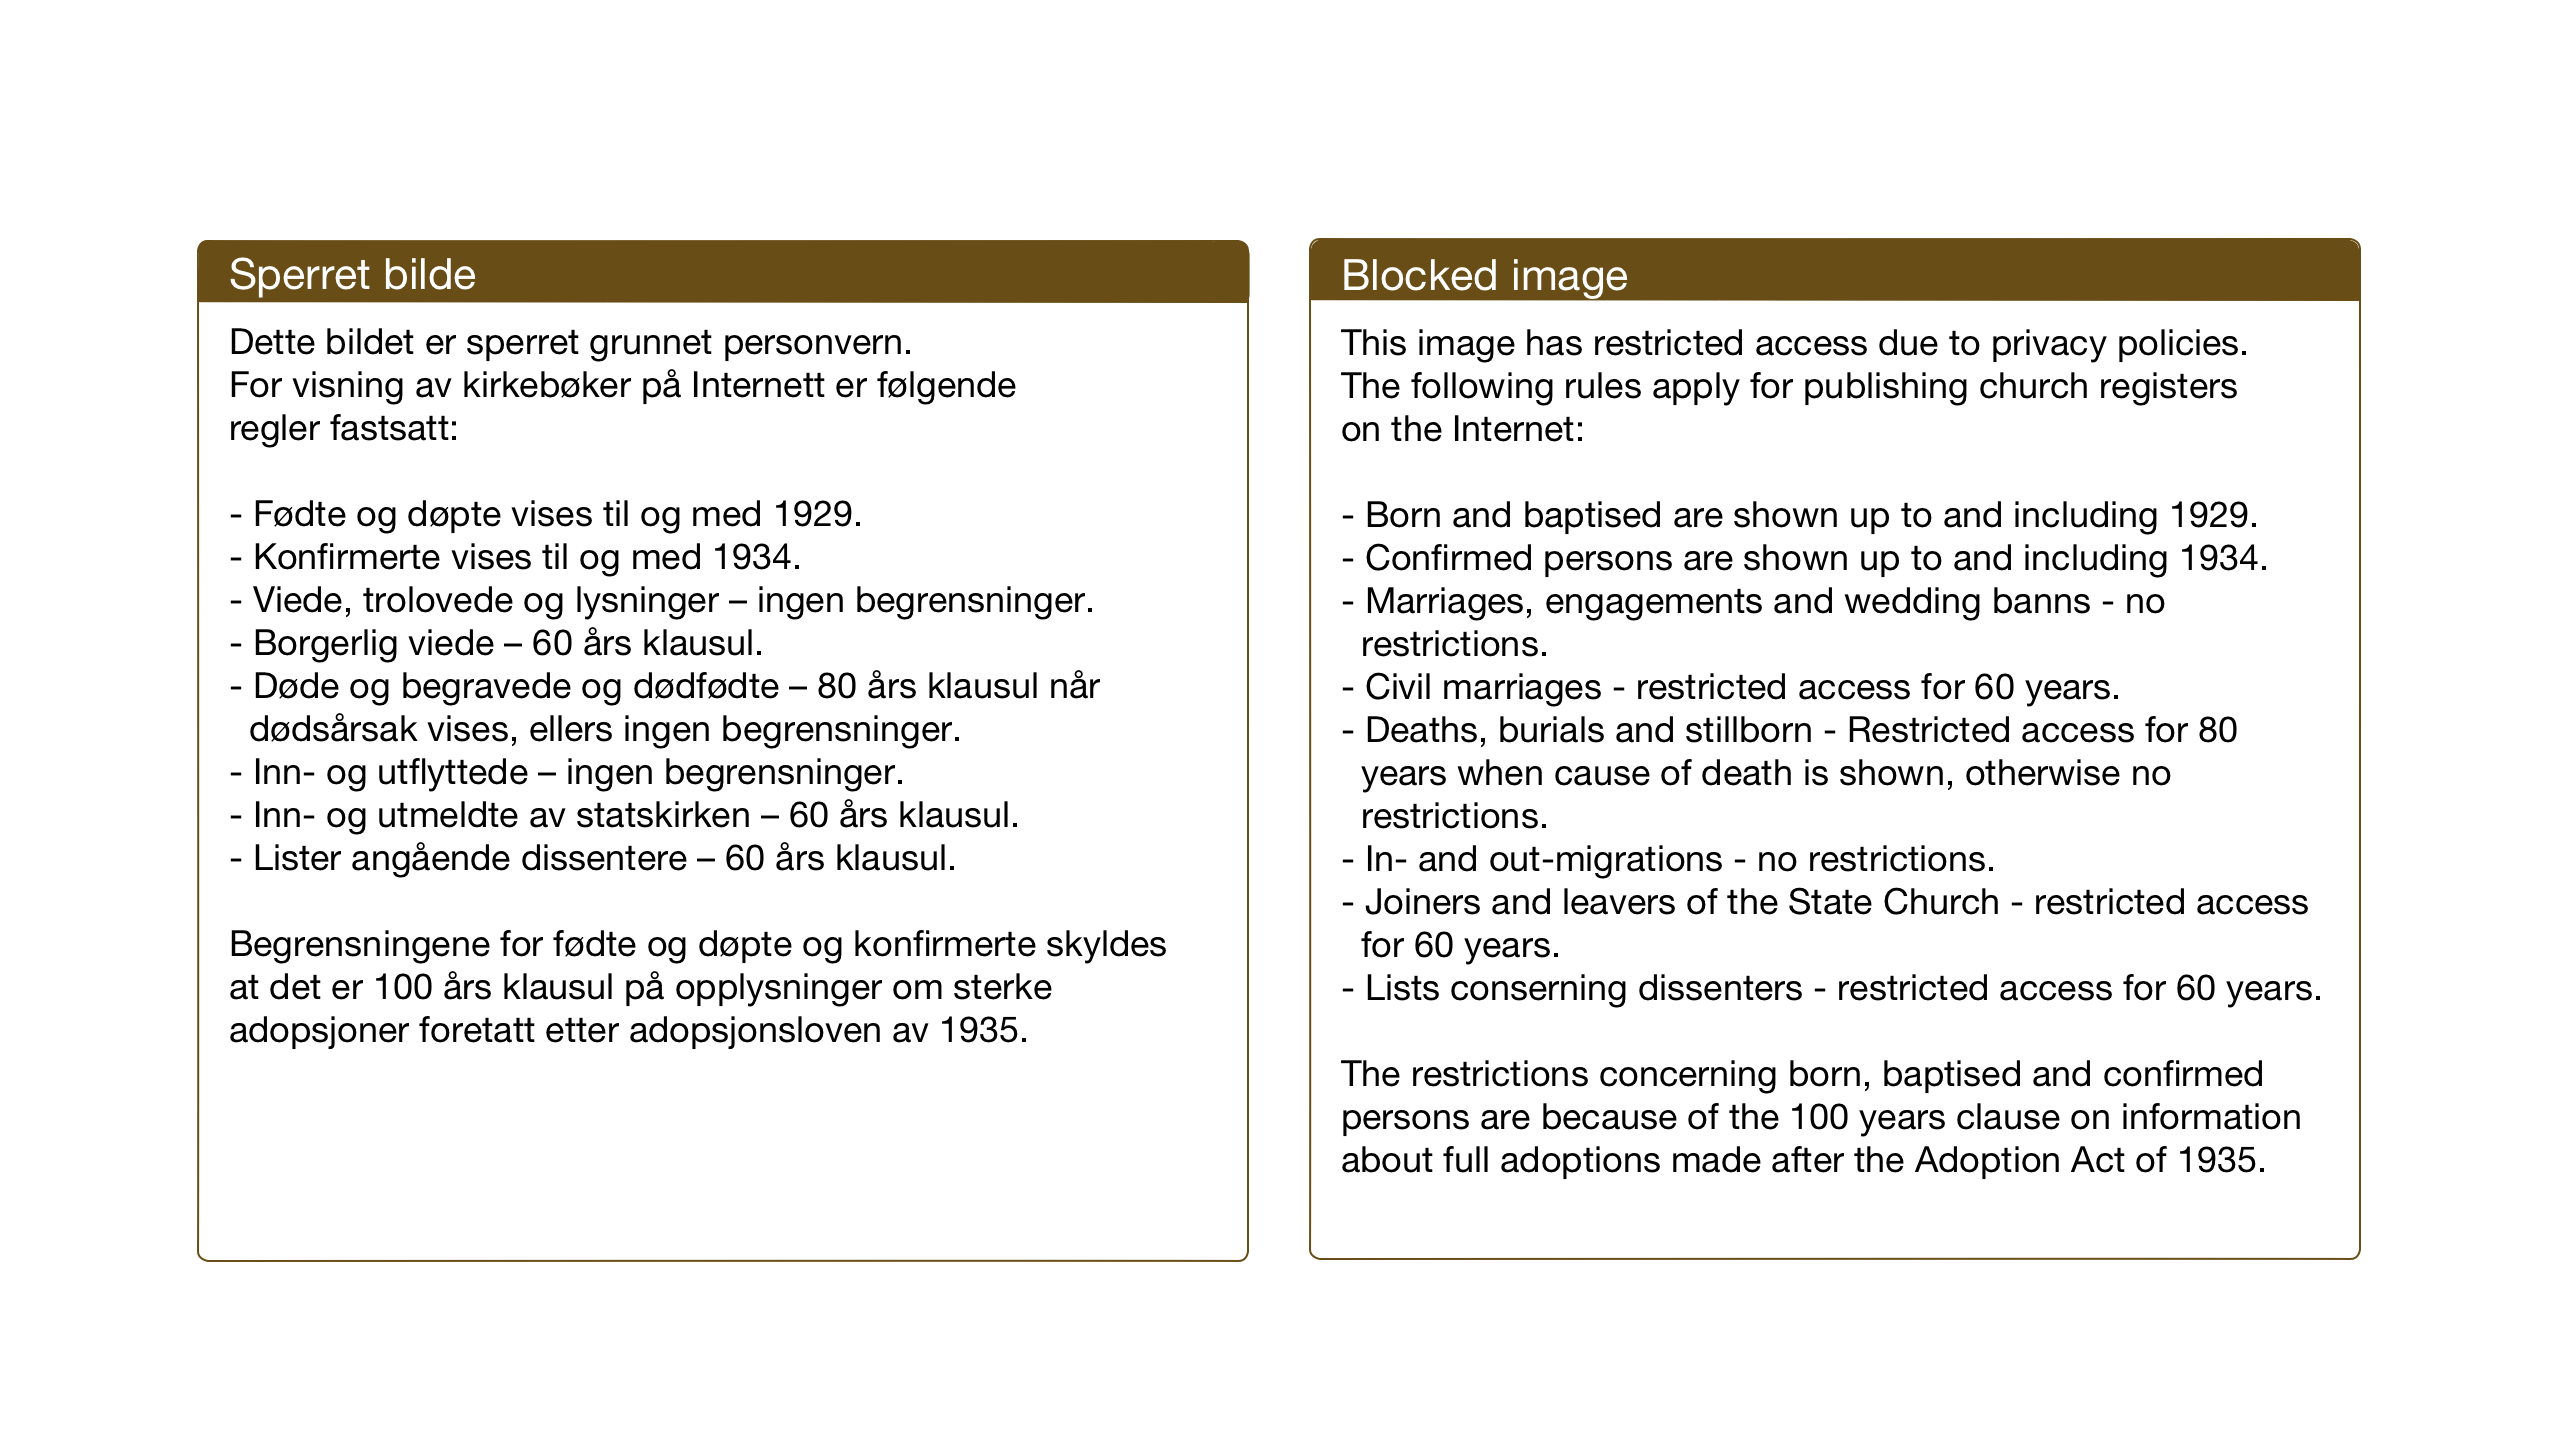 SAT, Ministerialprotokoller, klokkerbøker og fødselsregistre - Sør-Trøndelag, 604/L0210: Parish register (official) no. 604A30, 1932-1946, p. 106